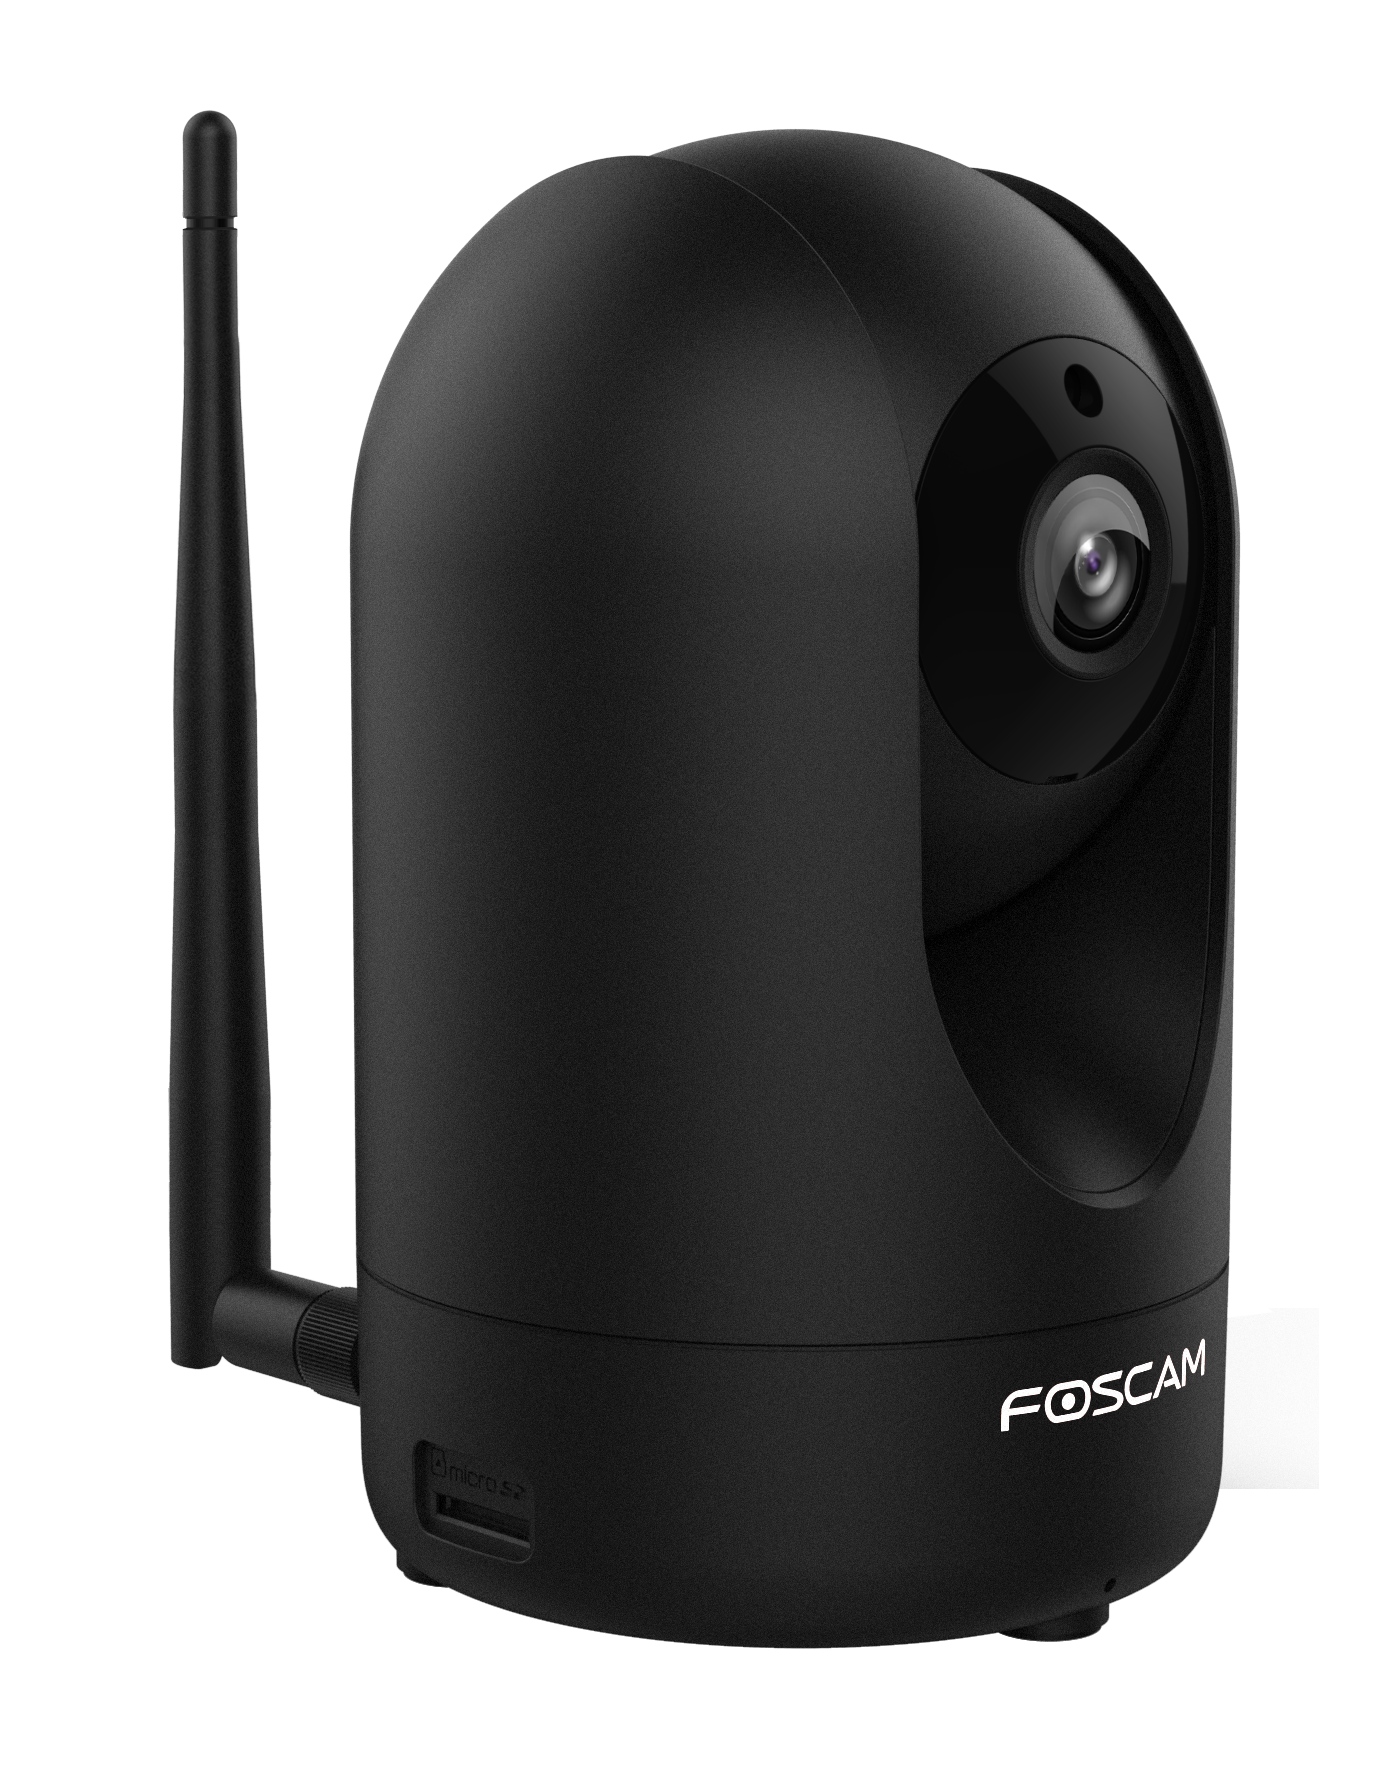 foscam fi9821p quick installation guide